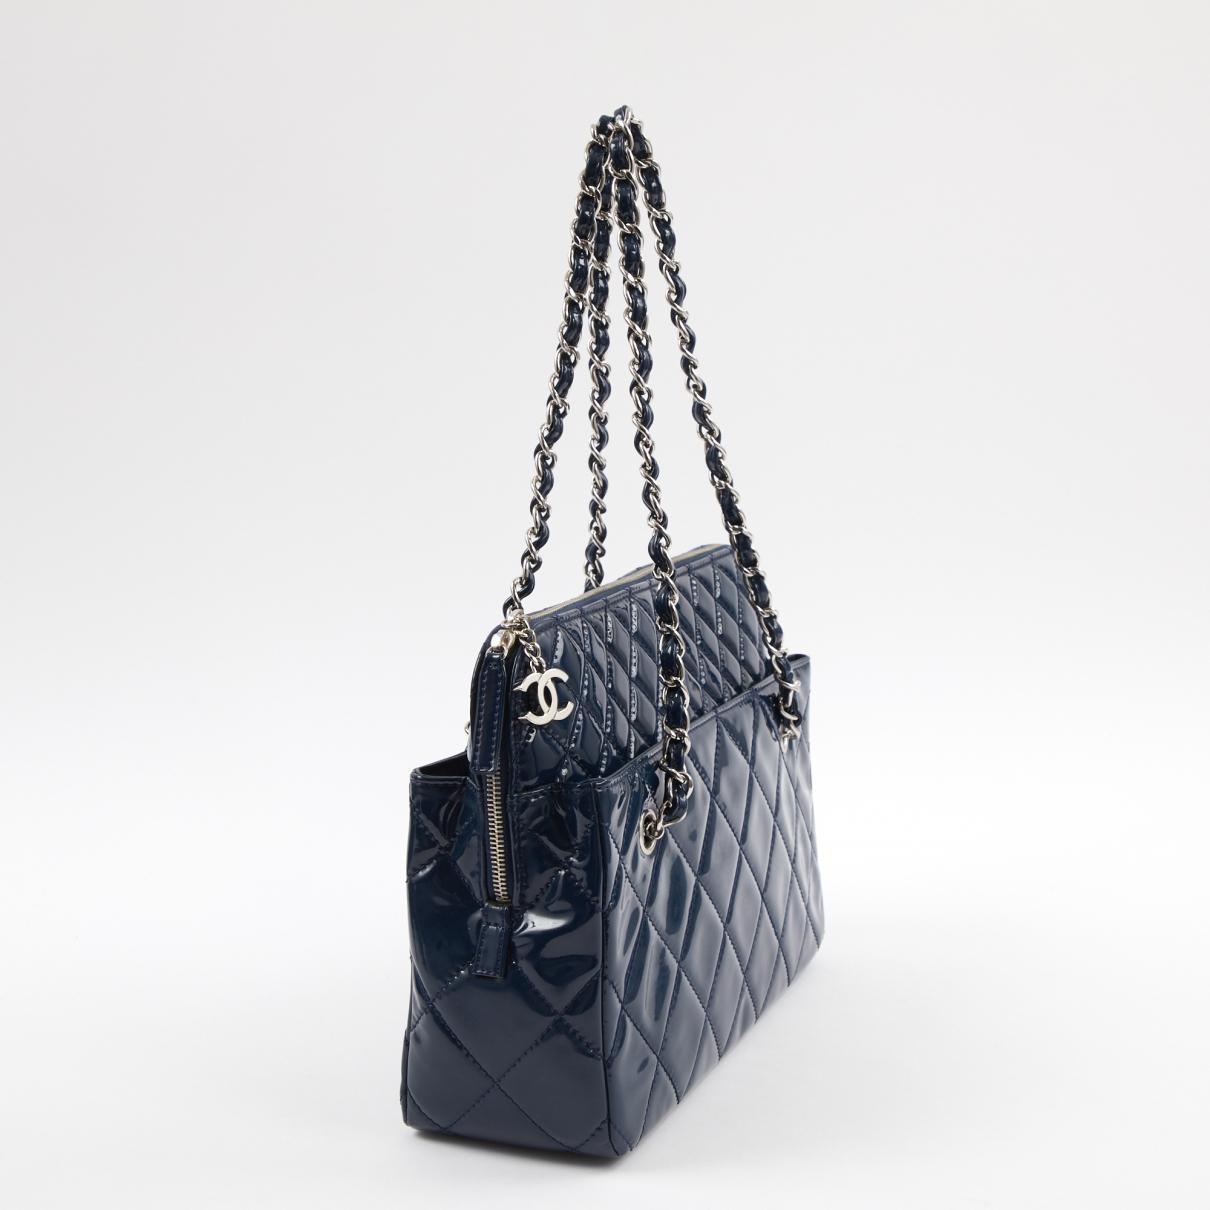 Chanel - Blue Patent Leather Handbag - Lyst. View fullscreen 2b0e3f236fa4f